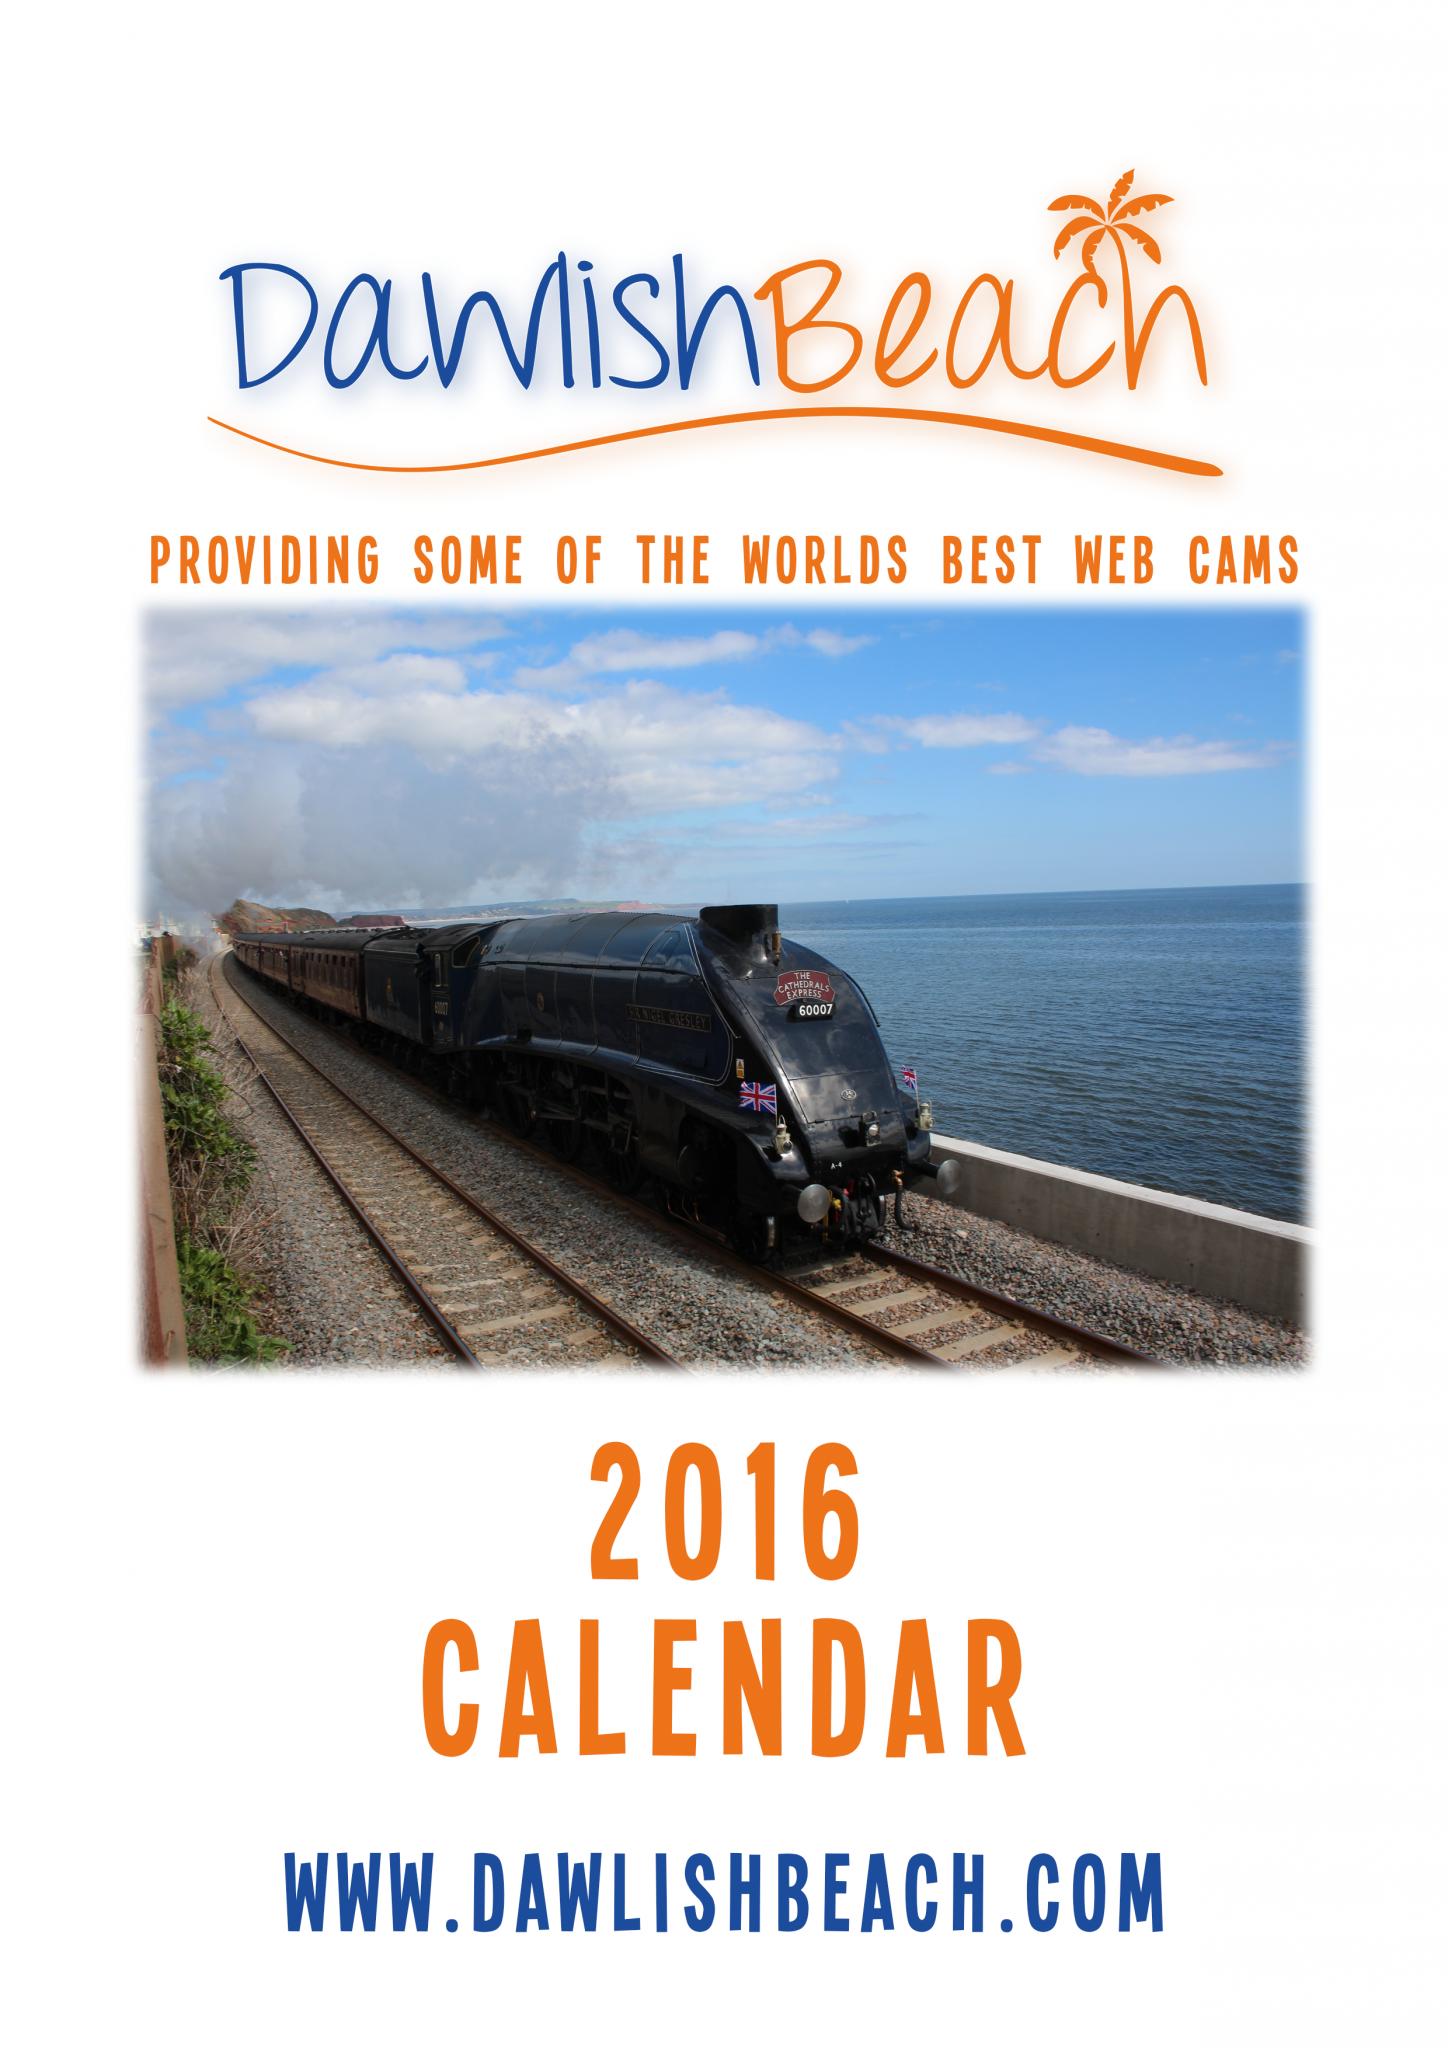 Dawlish Beach Calendars Selling Fast